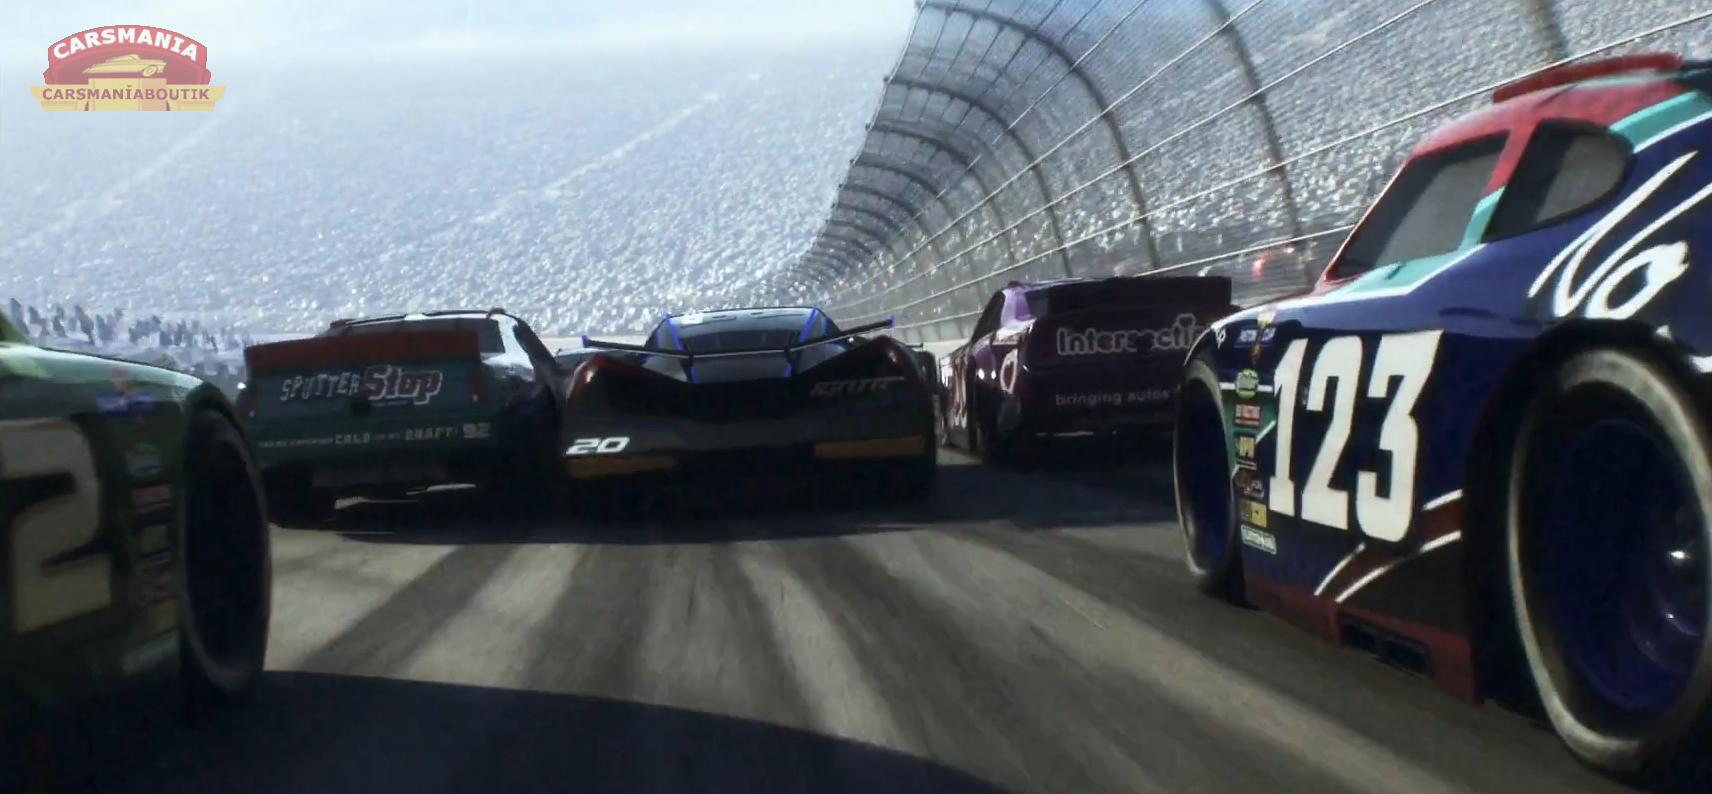 3Bande Annonce 3Bande Cars Cars Annonce Cars 3Bande 3Bande Cars Cars Annonce Annonce f6gv7yYb